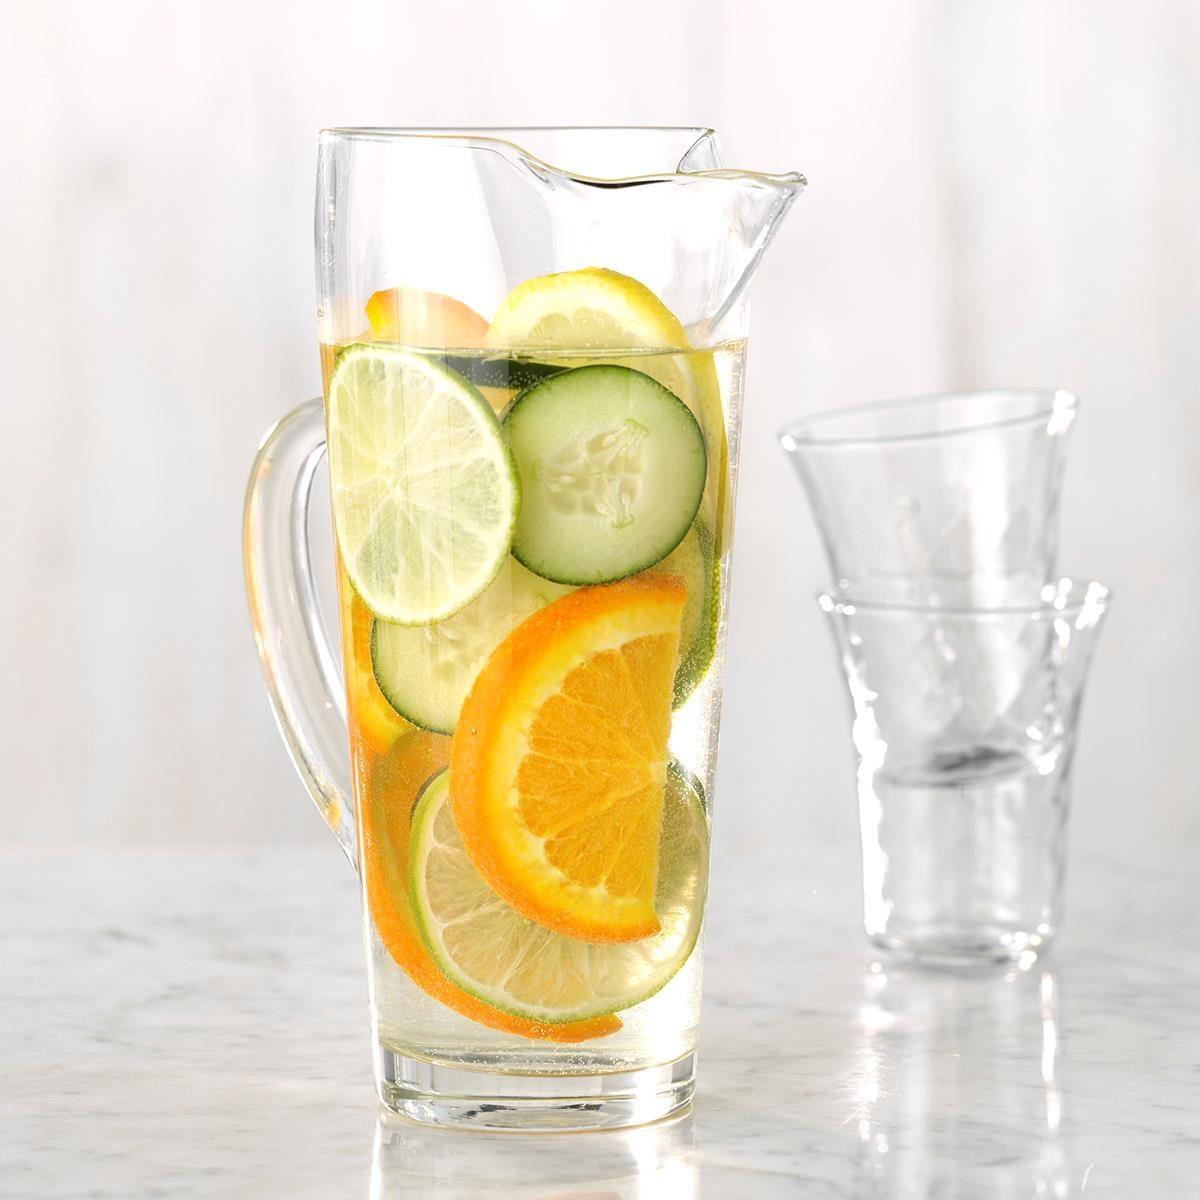 Citrus And Cucumber Infused Water Recipe